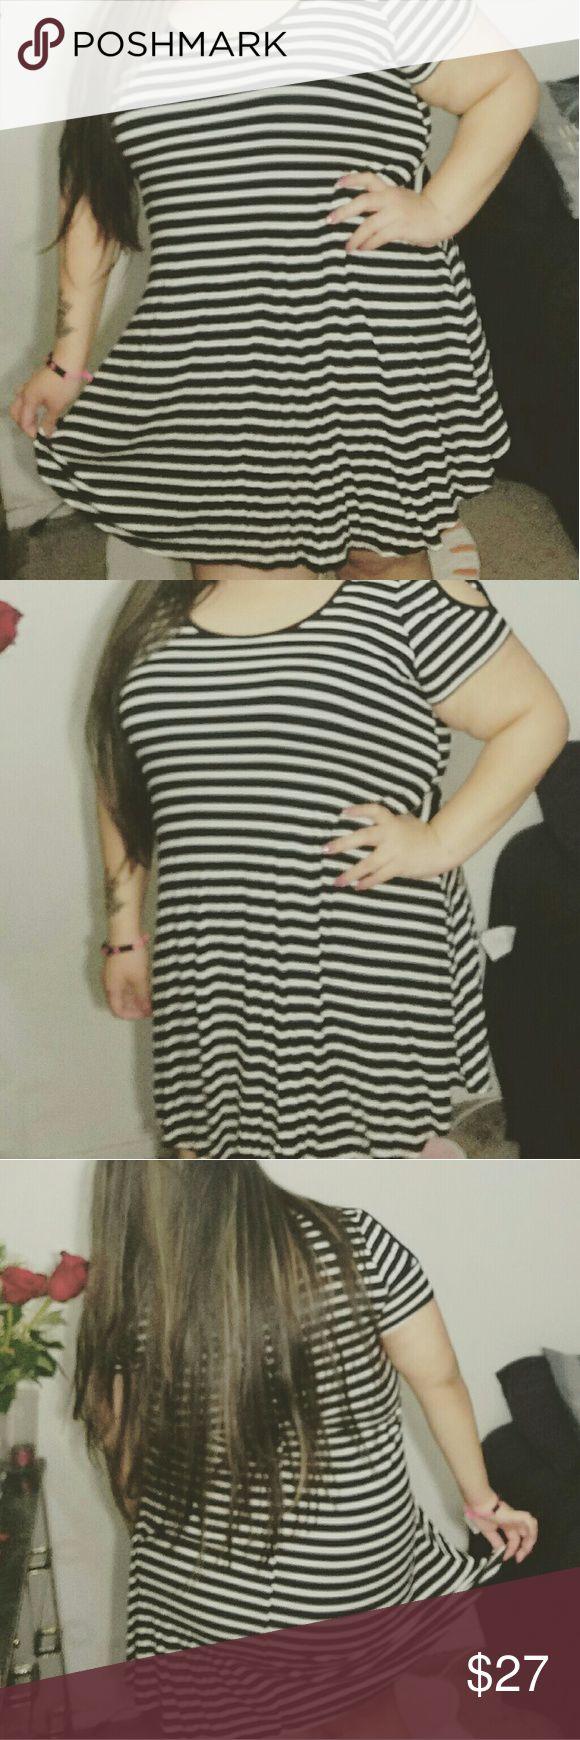 Black and white striped cold shoulder dress New Cold shoulder summer dress Dresses Mini